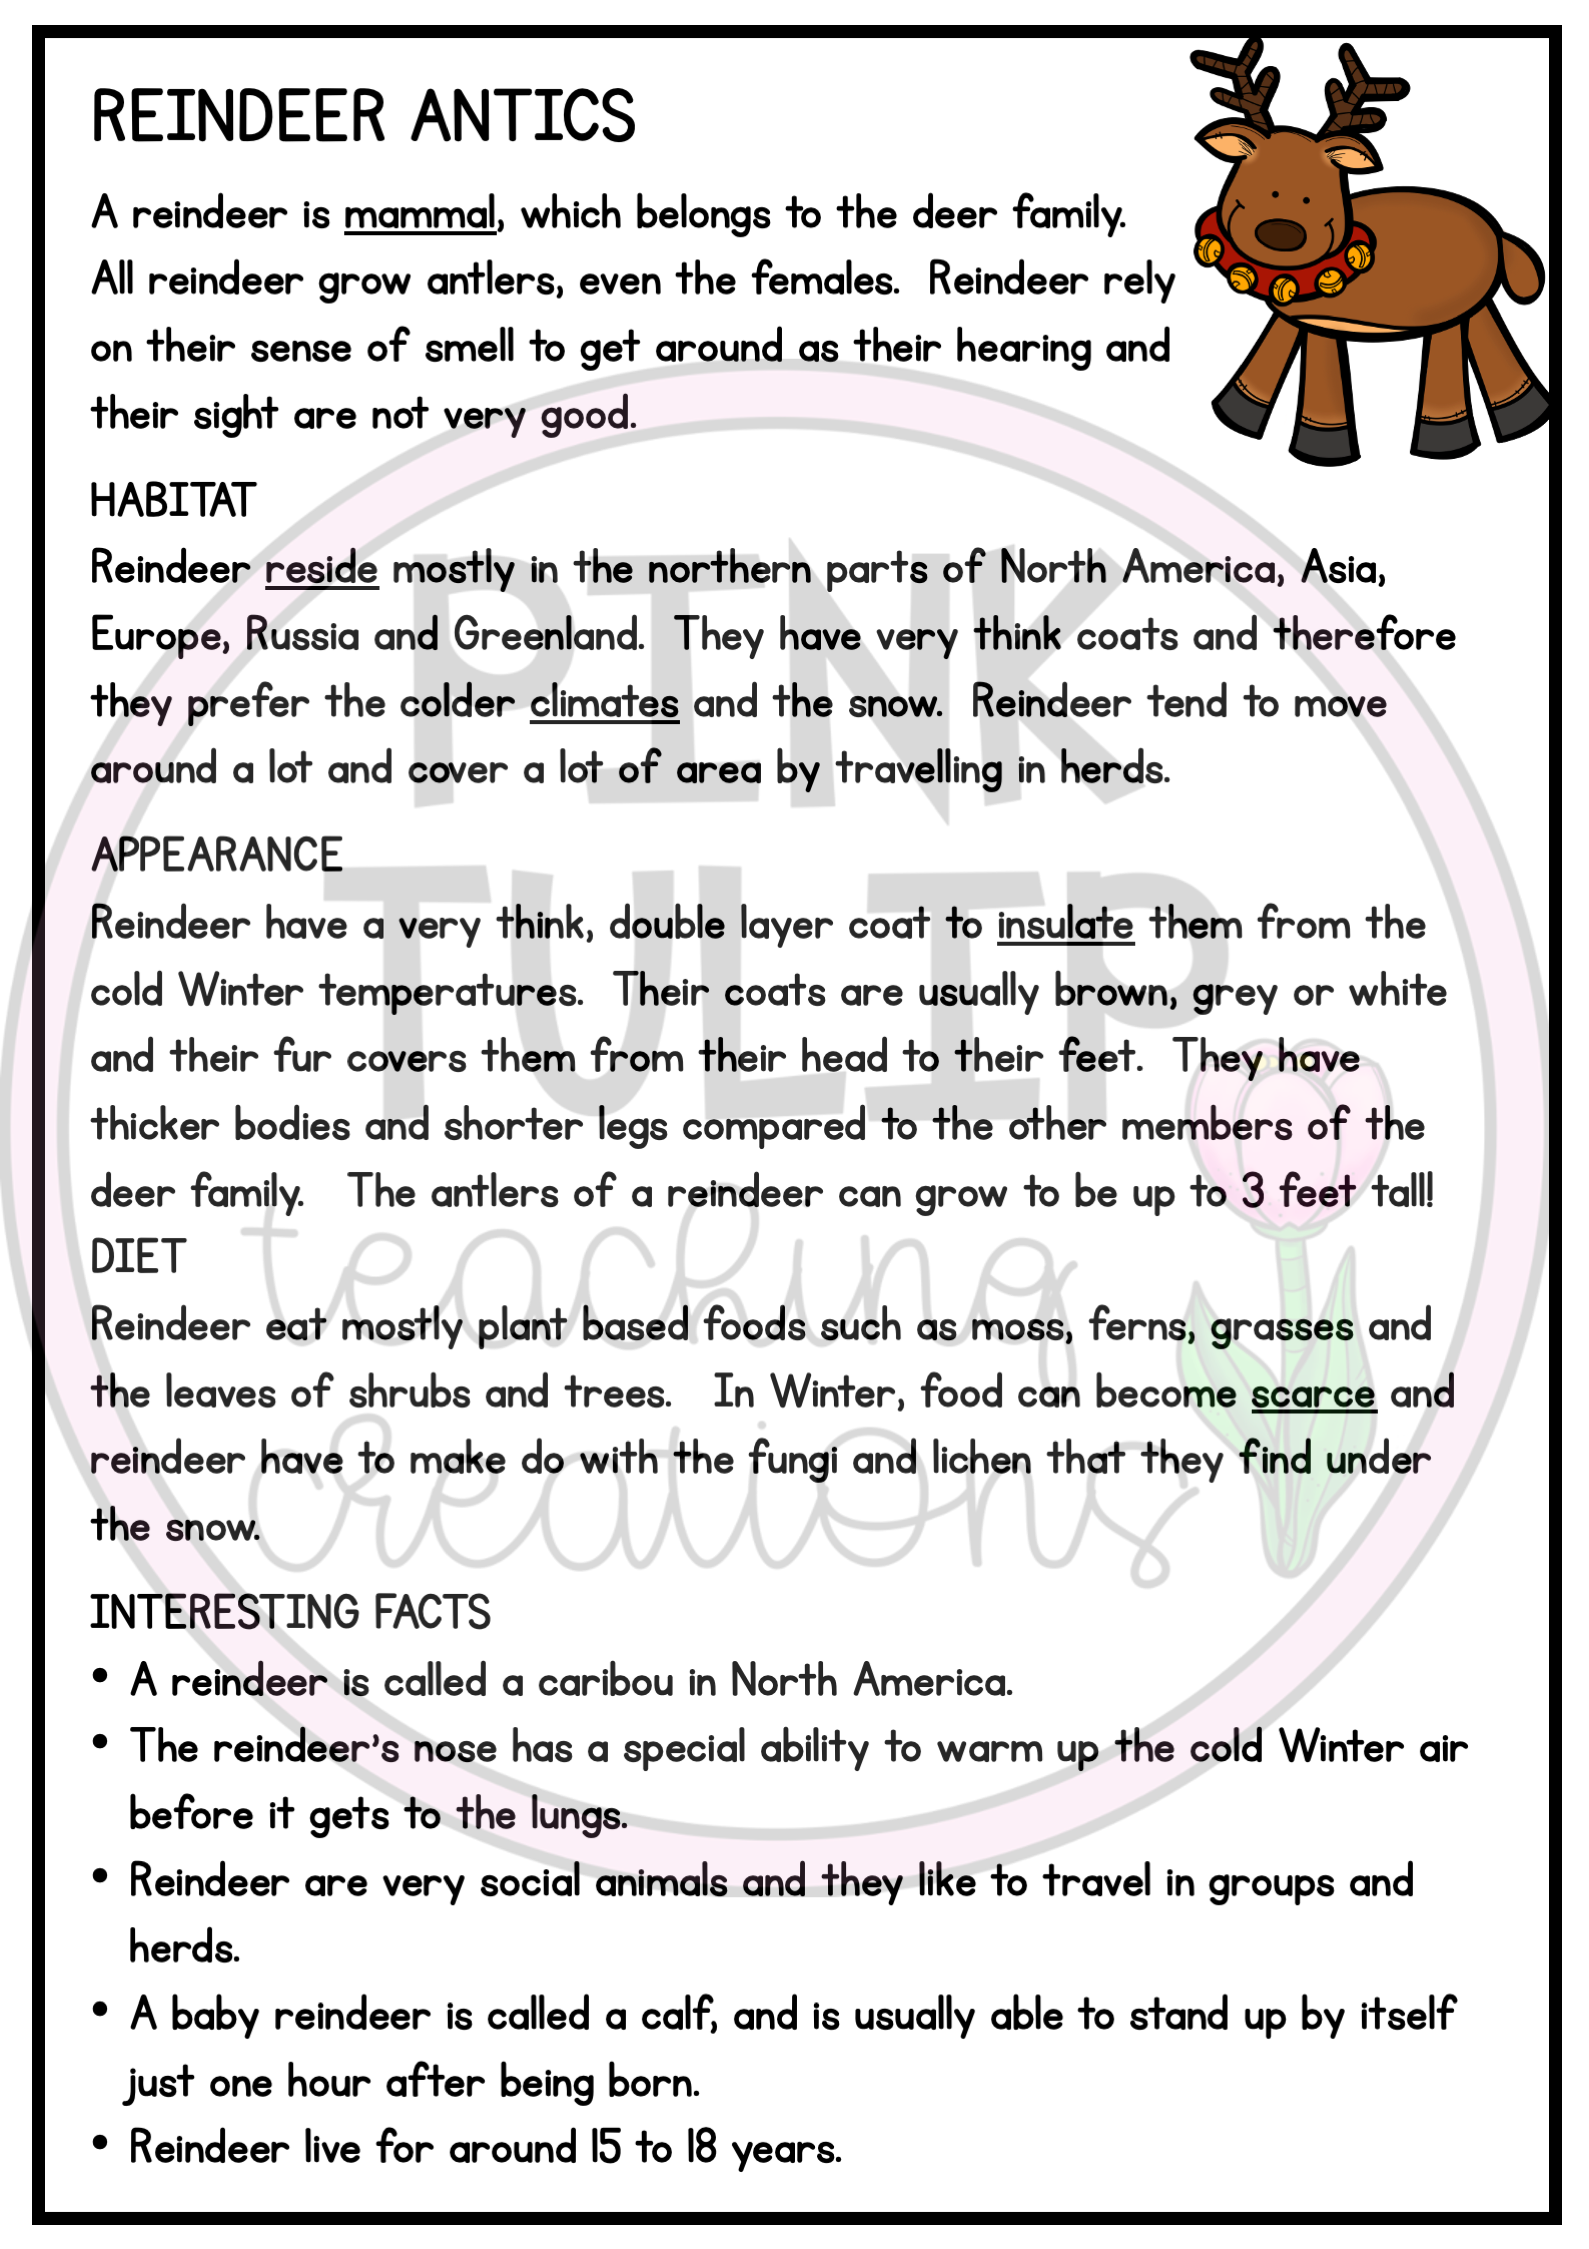 Reindeer Antics Christmas Comprehension Reading Strategy Worksheet Reading Comprehension Resources Reading Strategies Comprehension [ 2249 x 1589 Pixel ]